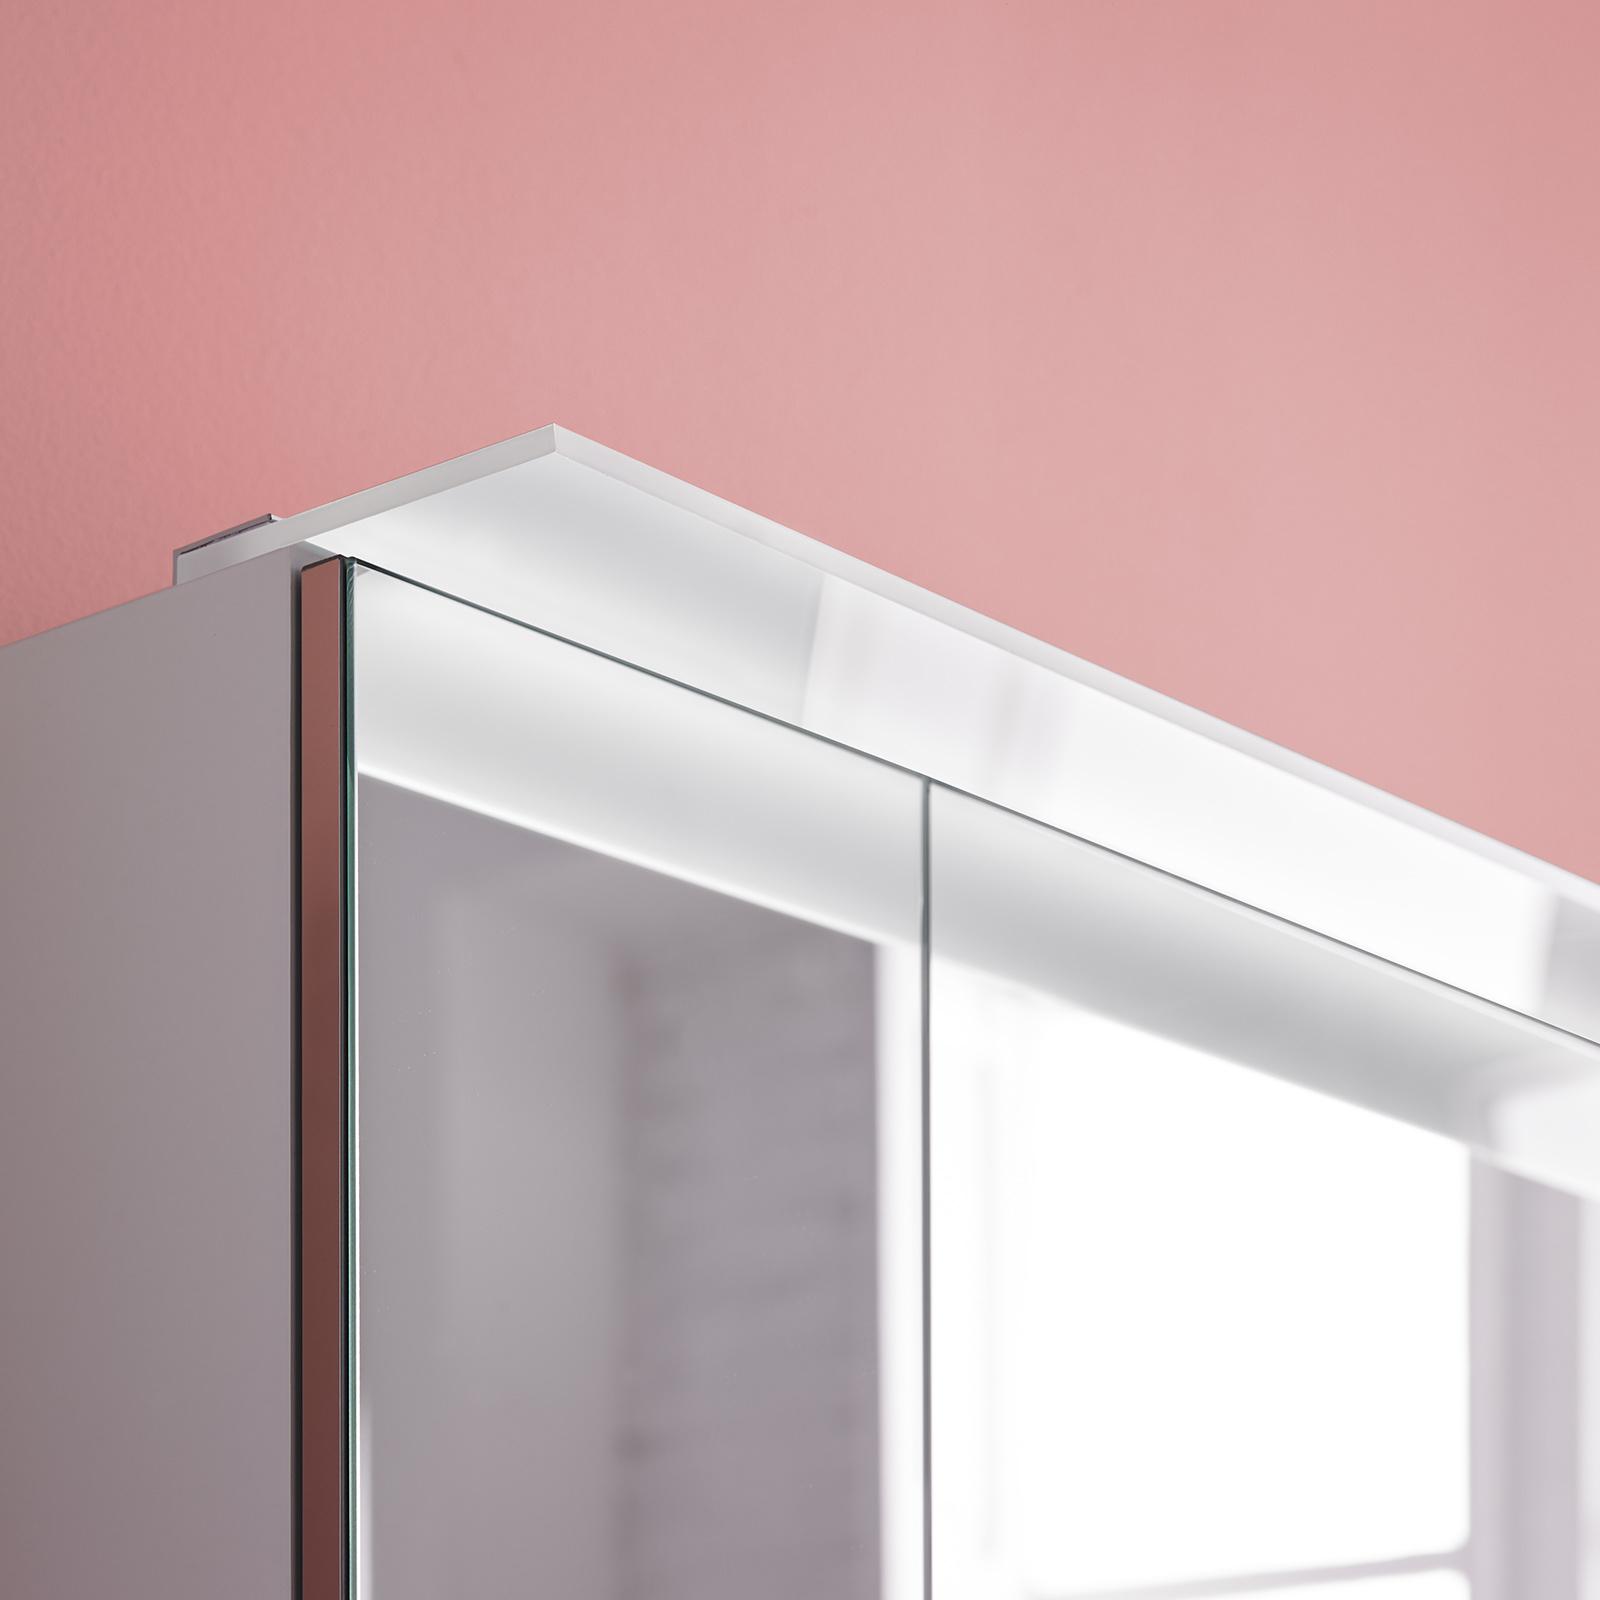 LED-möbelpåbyggnadslampa Adele, bredd 80 cm